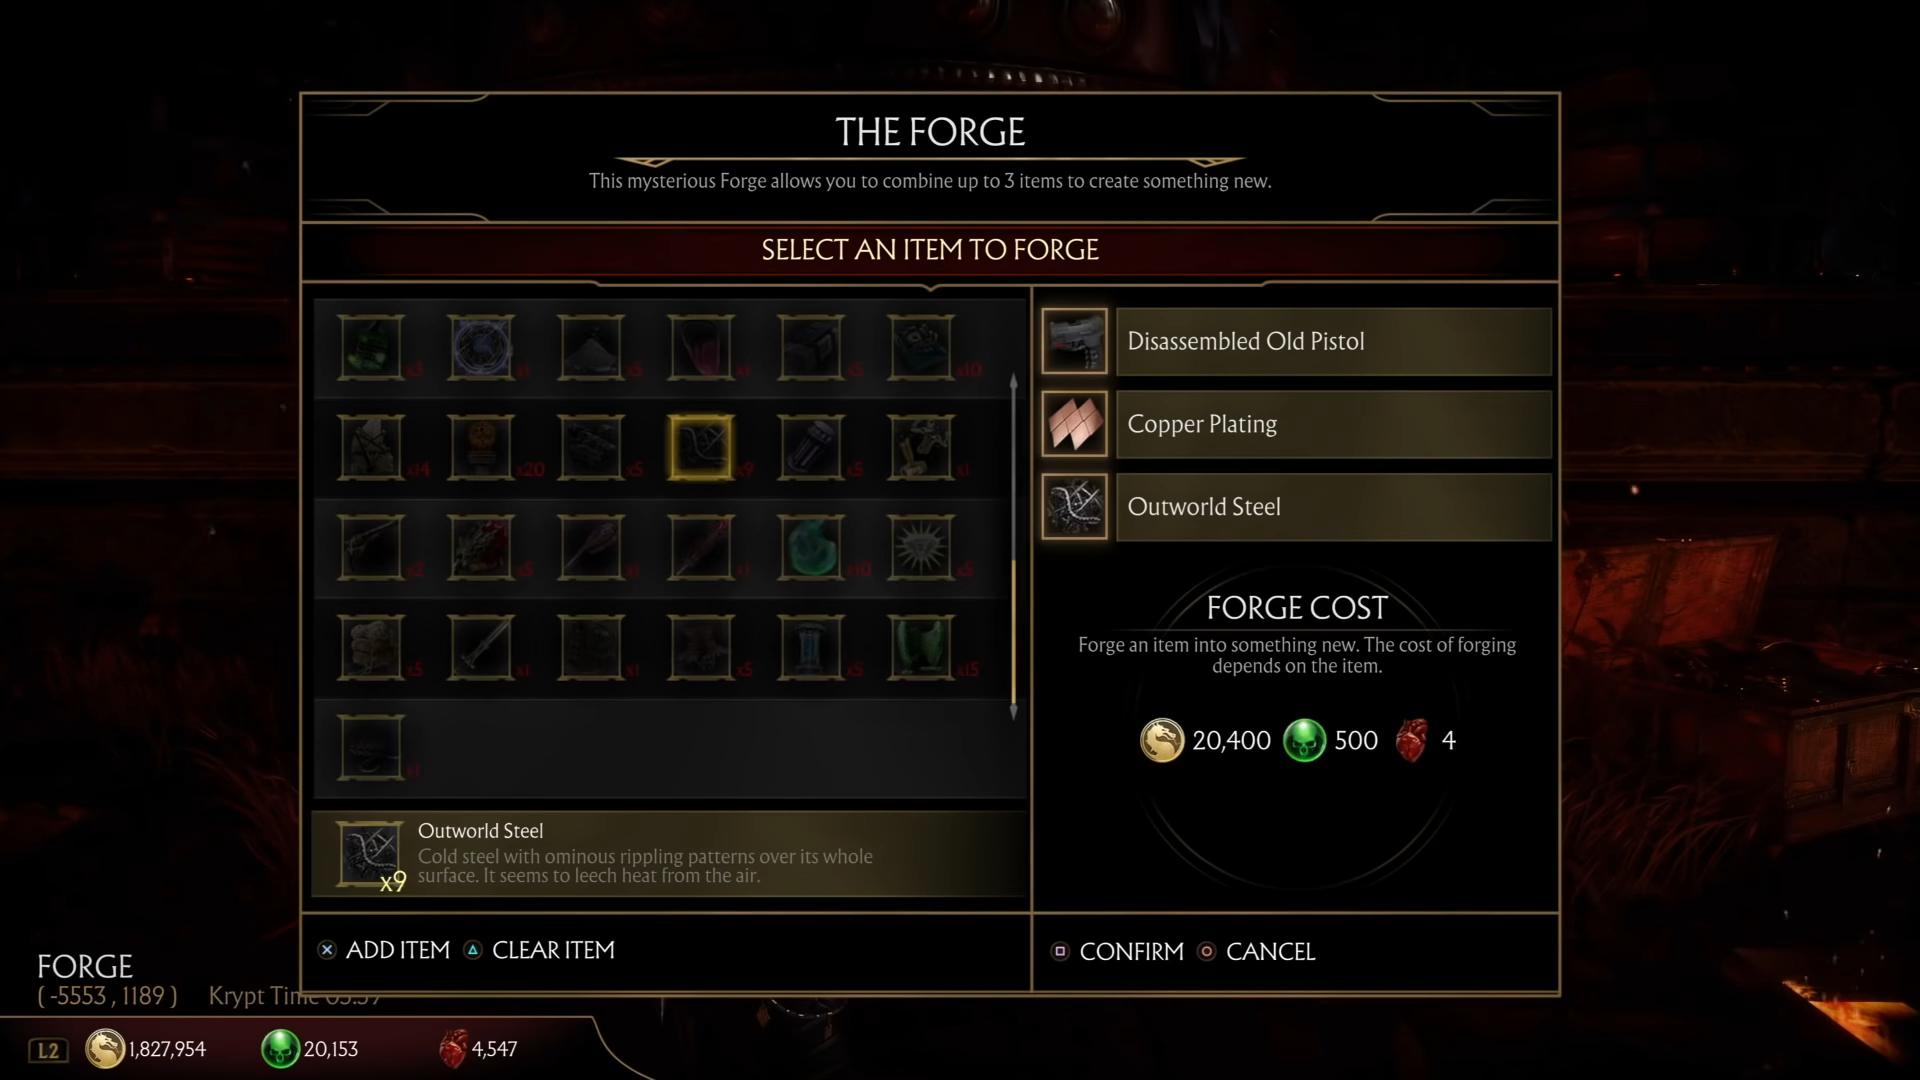 Mortal Kombat 11 Forge recipes